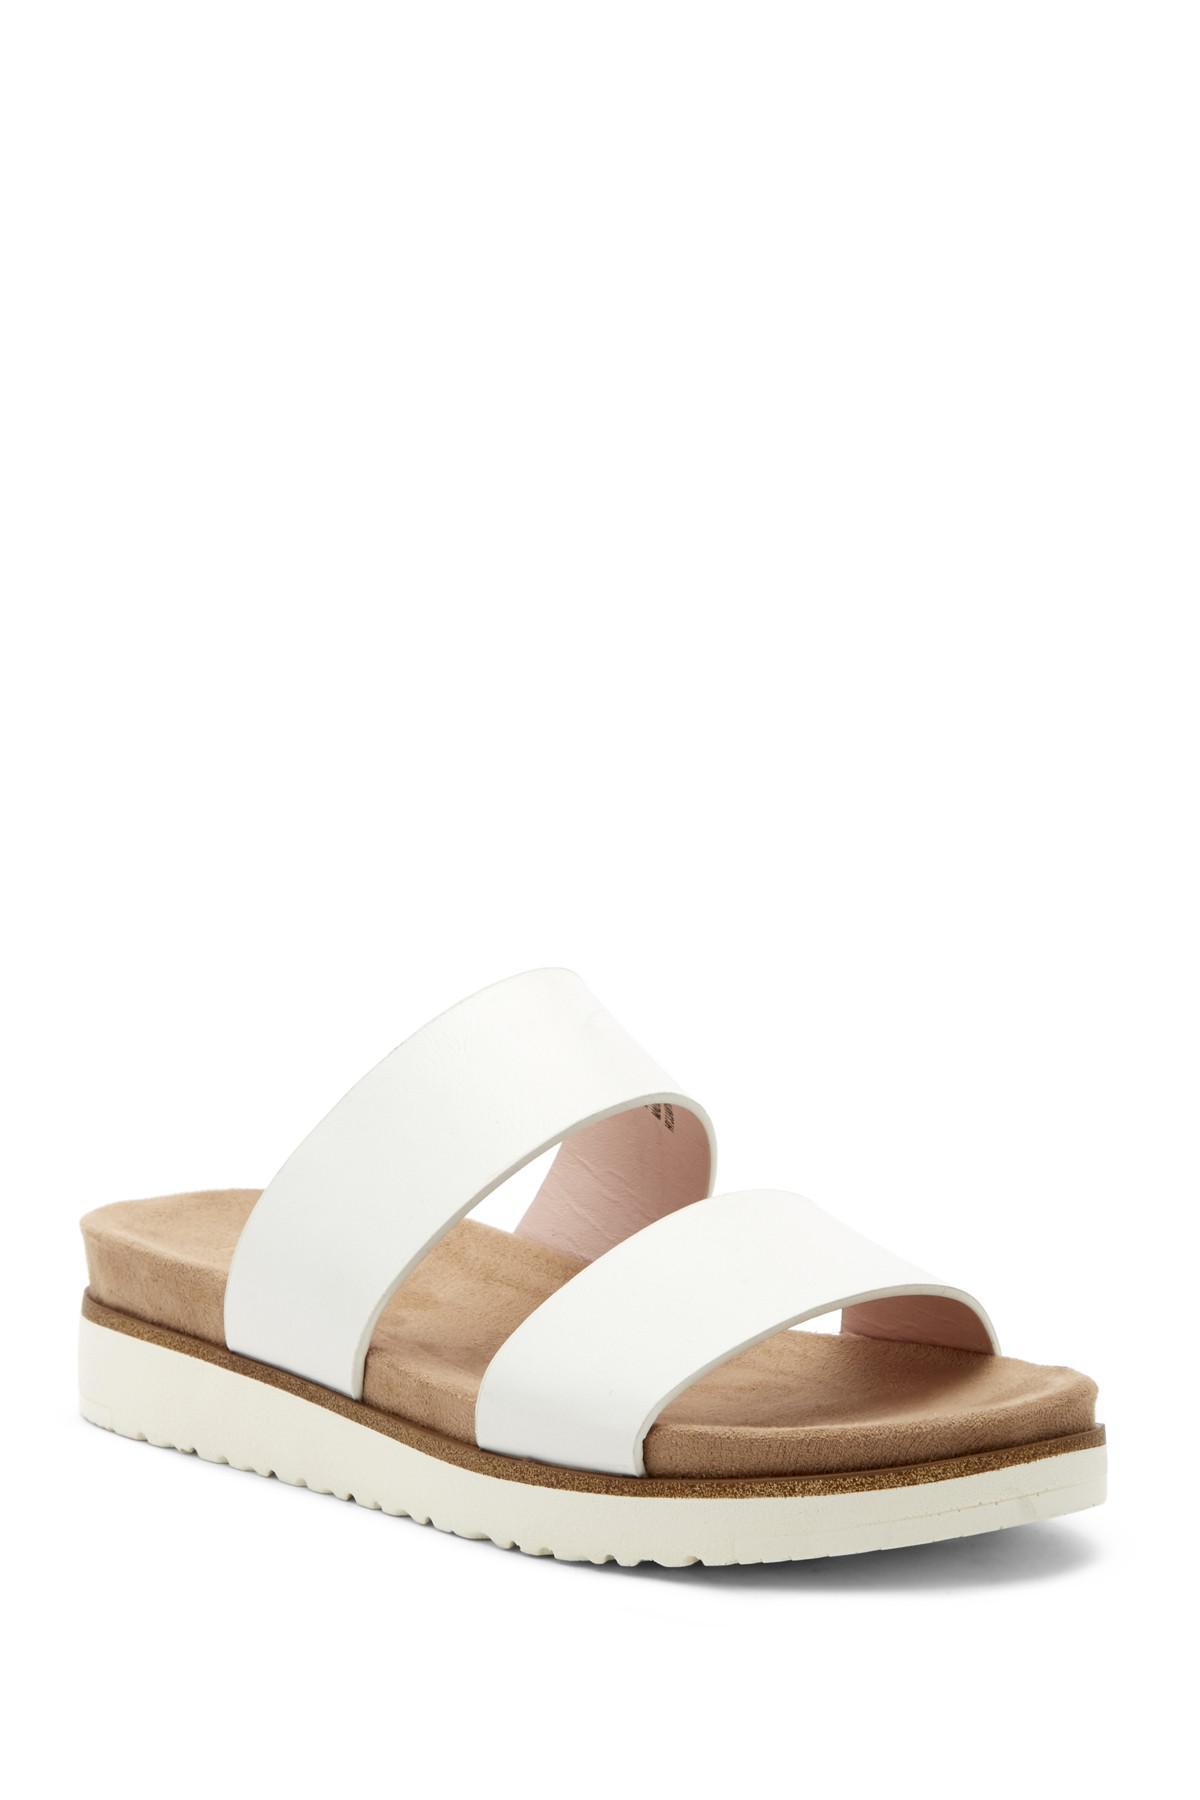 Kensie Dominic Slide Sandal 44Nn0Q1qRW